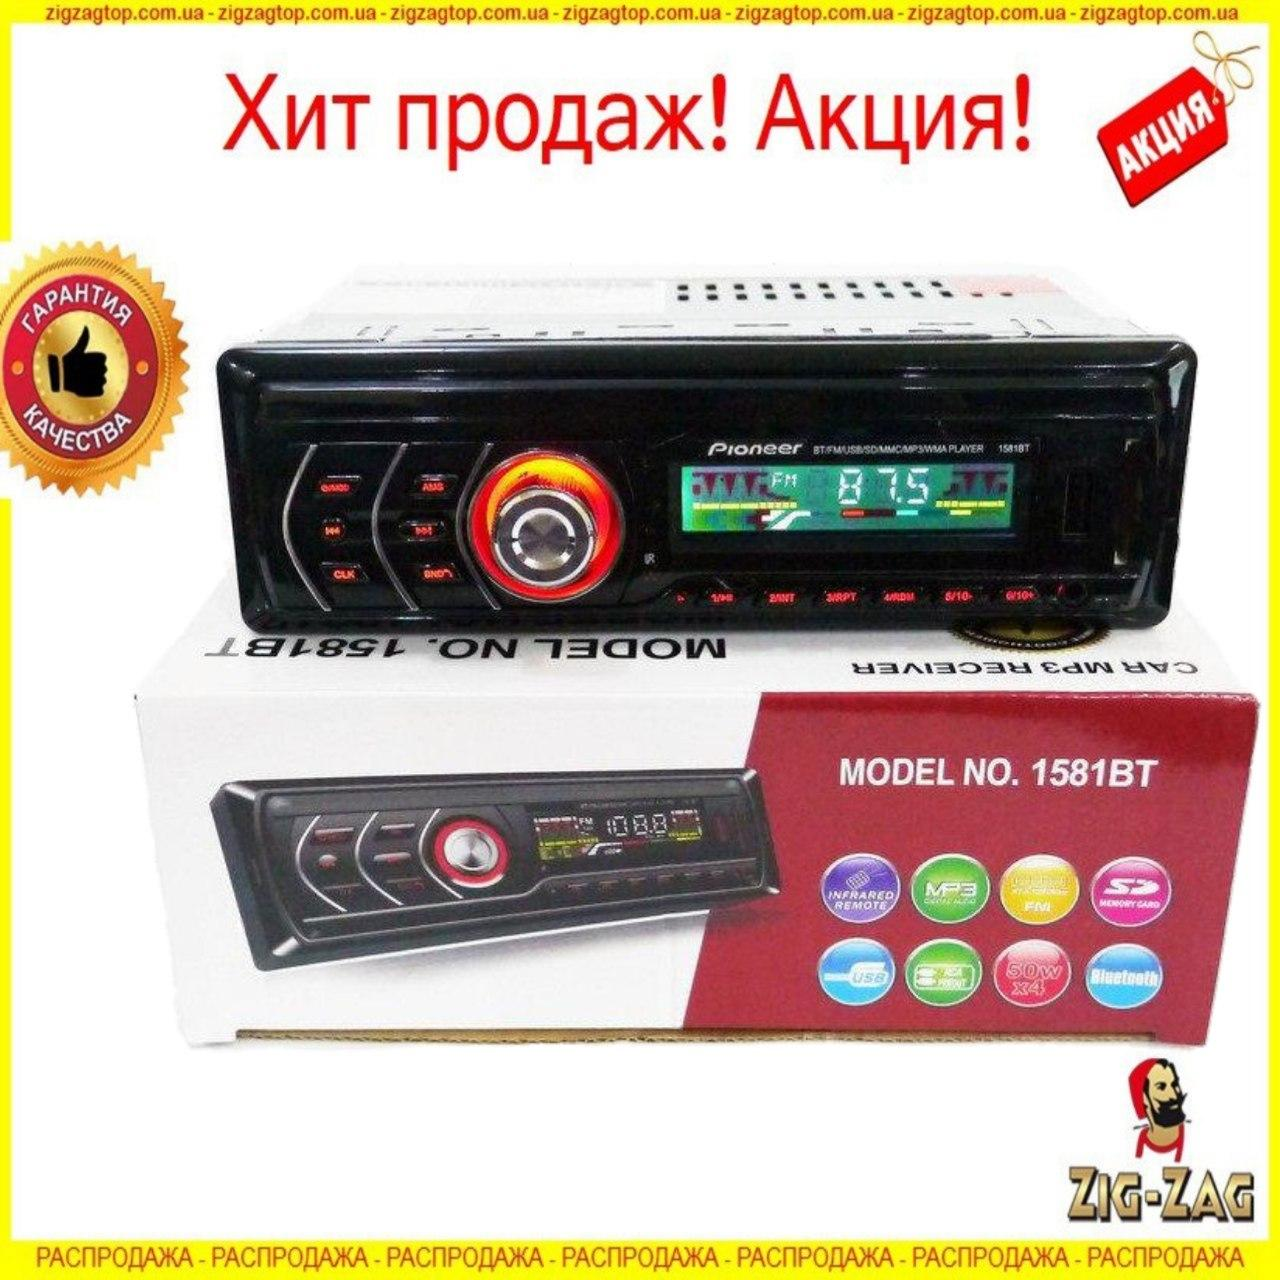 Автомагнитола с Пультом Pioneer 1DIN 1581BT Bluetooth магнитола Пионер в Машину авто MP3+FM+USB+SD+AUX Блютуз